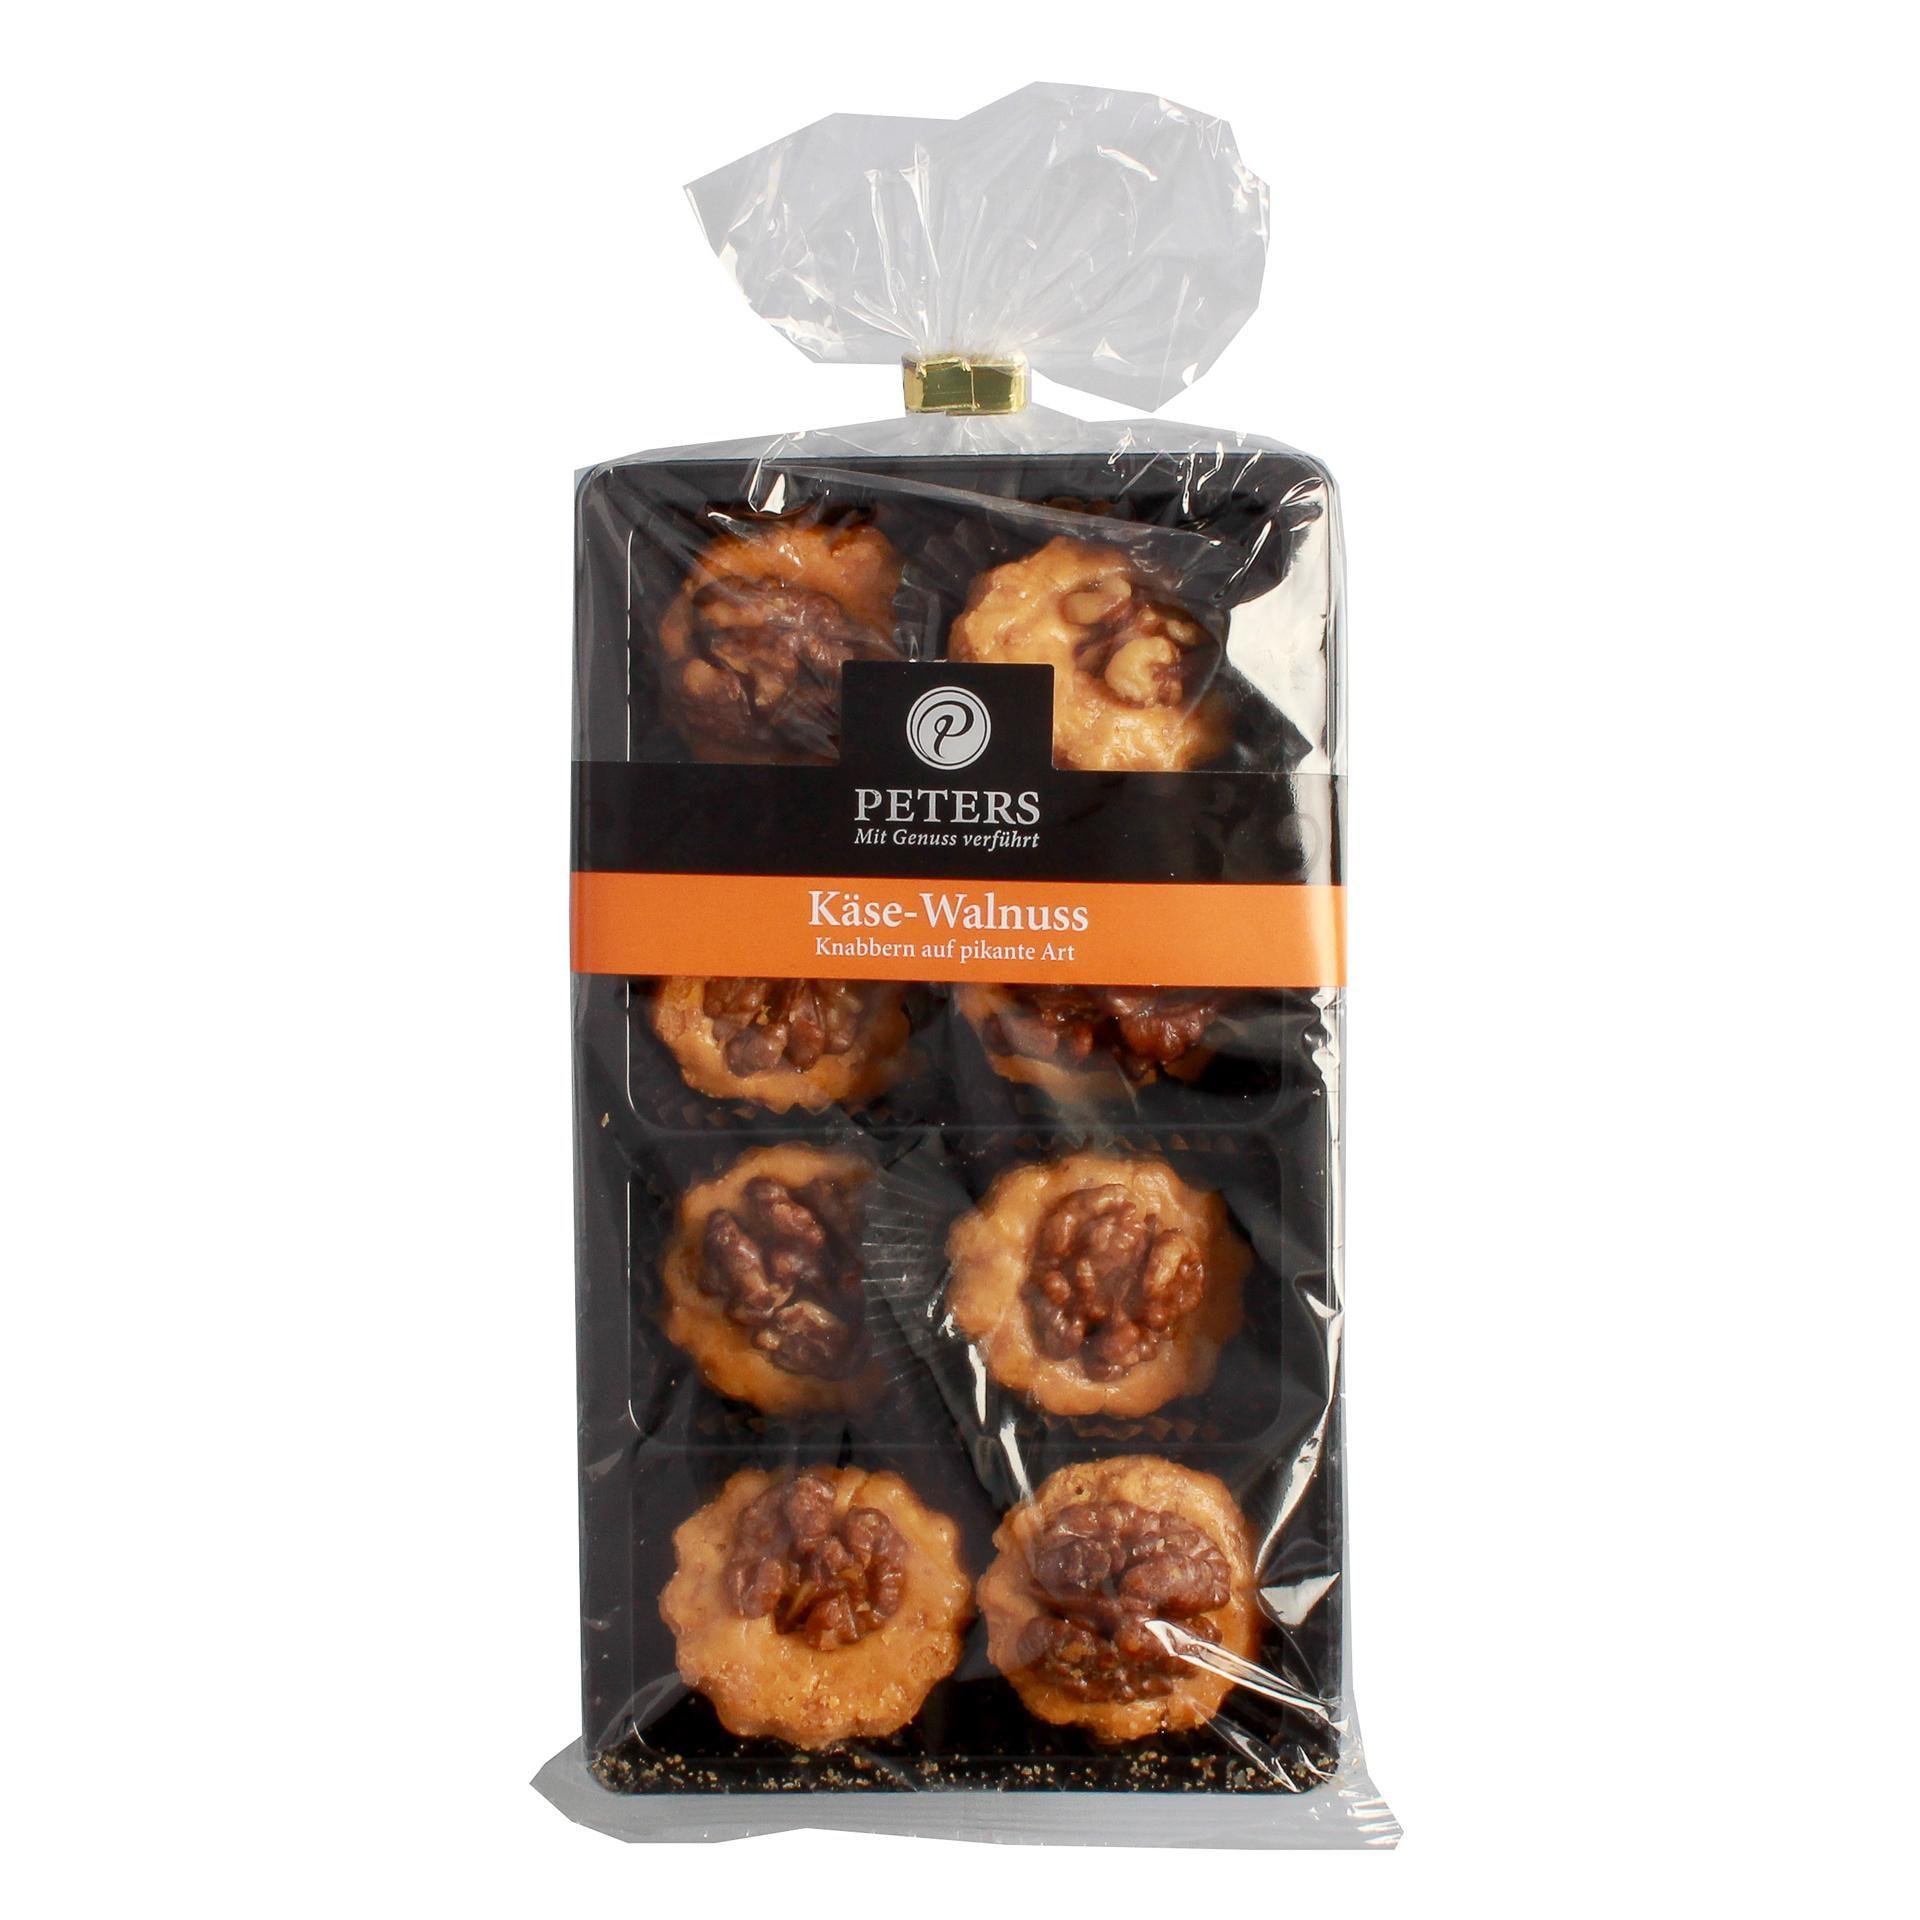 Peters - Käse-Walnuss Häppchen Snack Knabberkram Cracker Kräcker - 100g